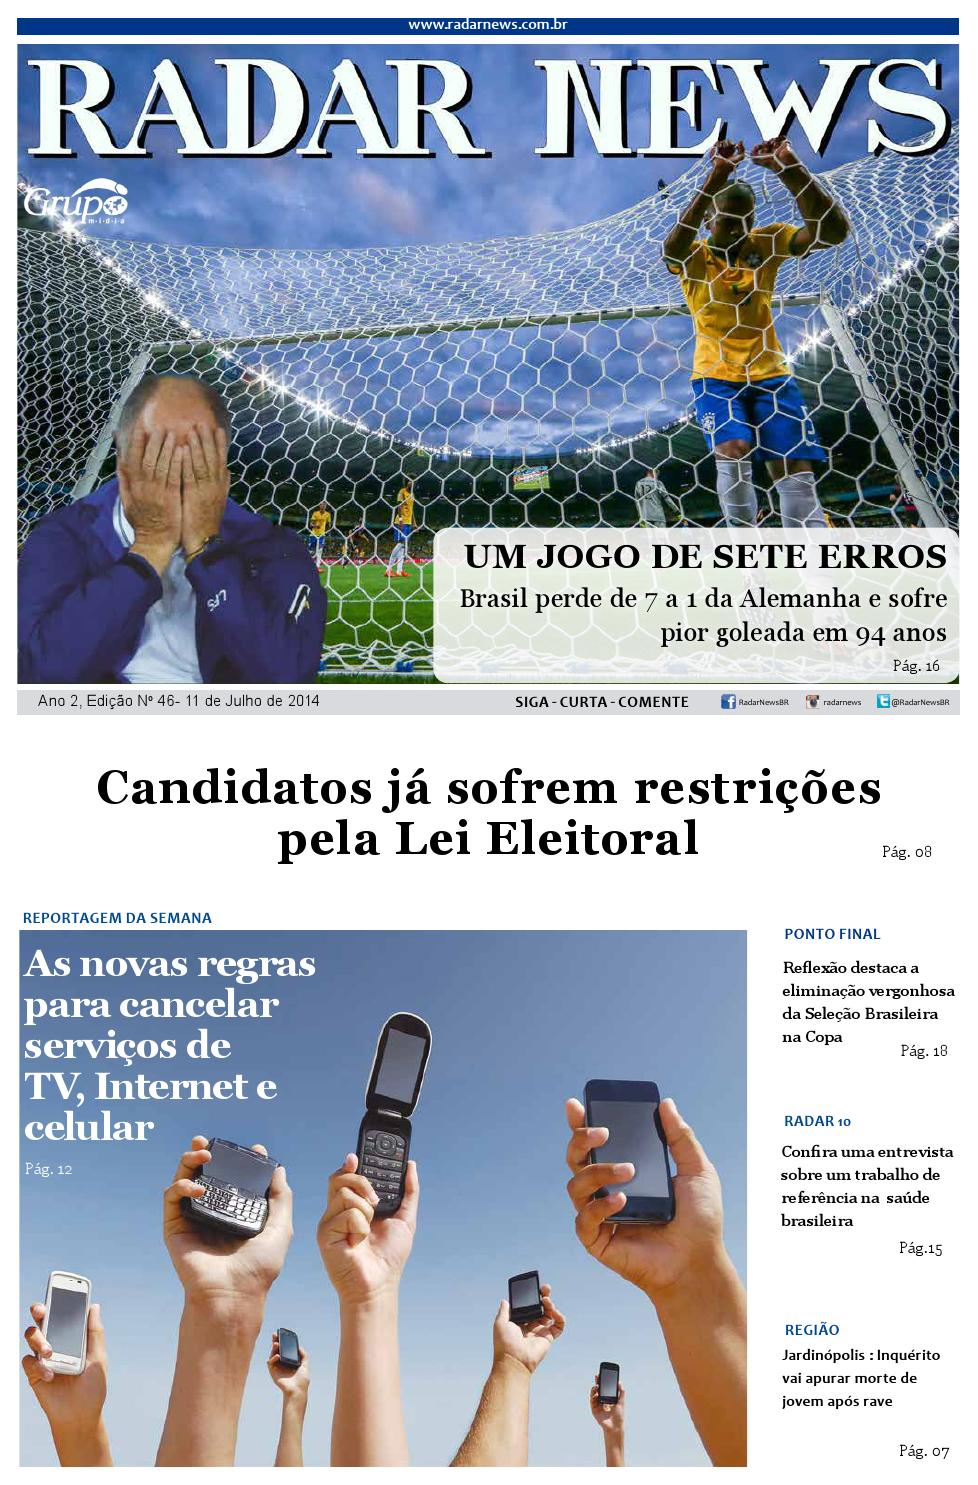 435d20c8d97 Radar News 46ª Edição by Grupo Mídia - issuu